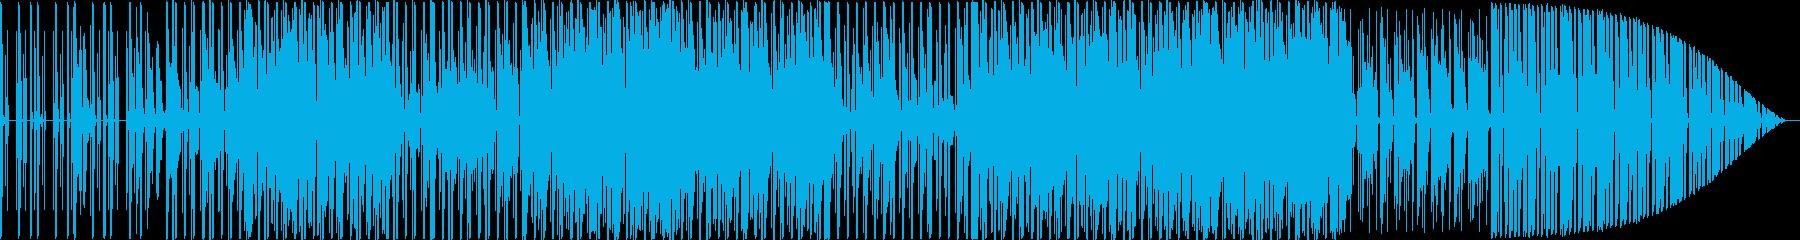 technoですの再生済みの波形